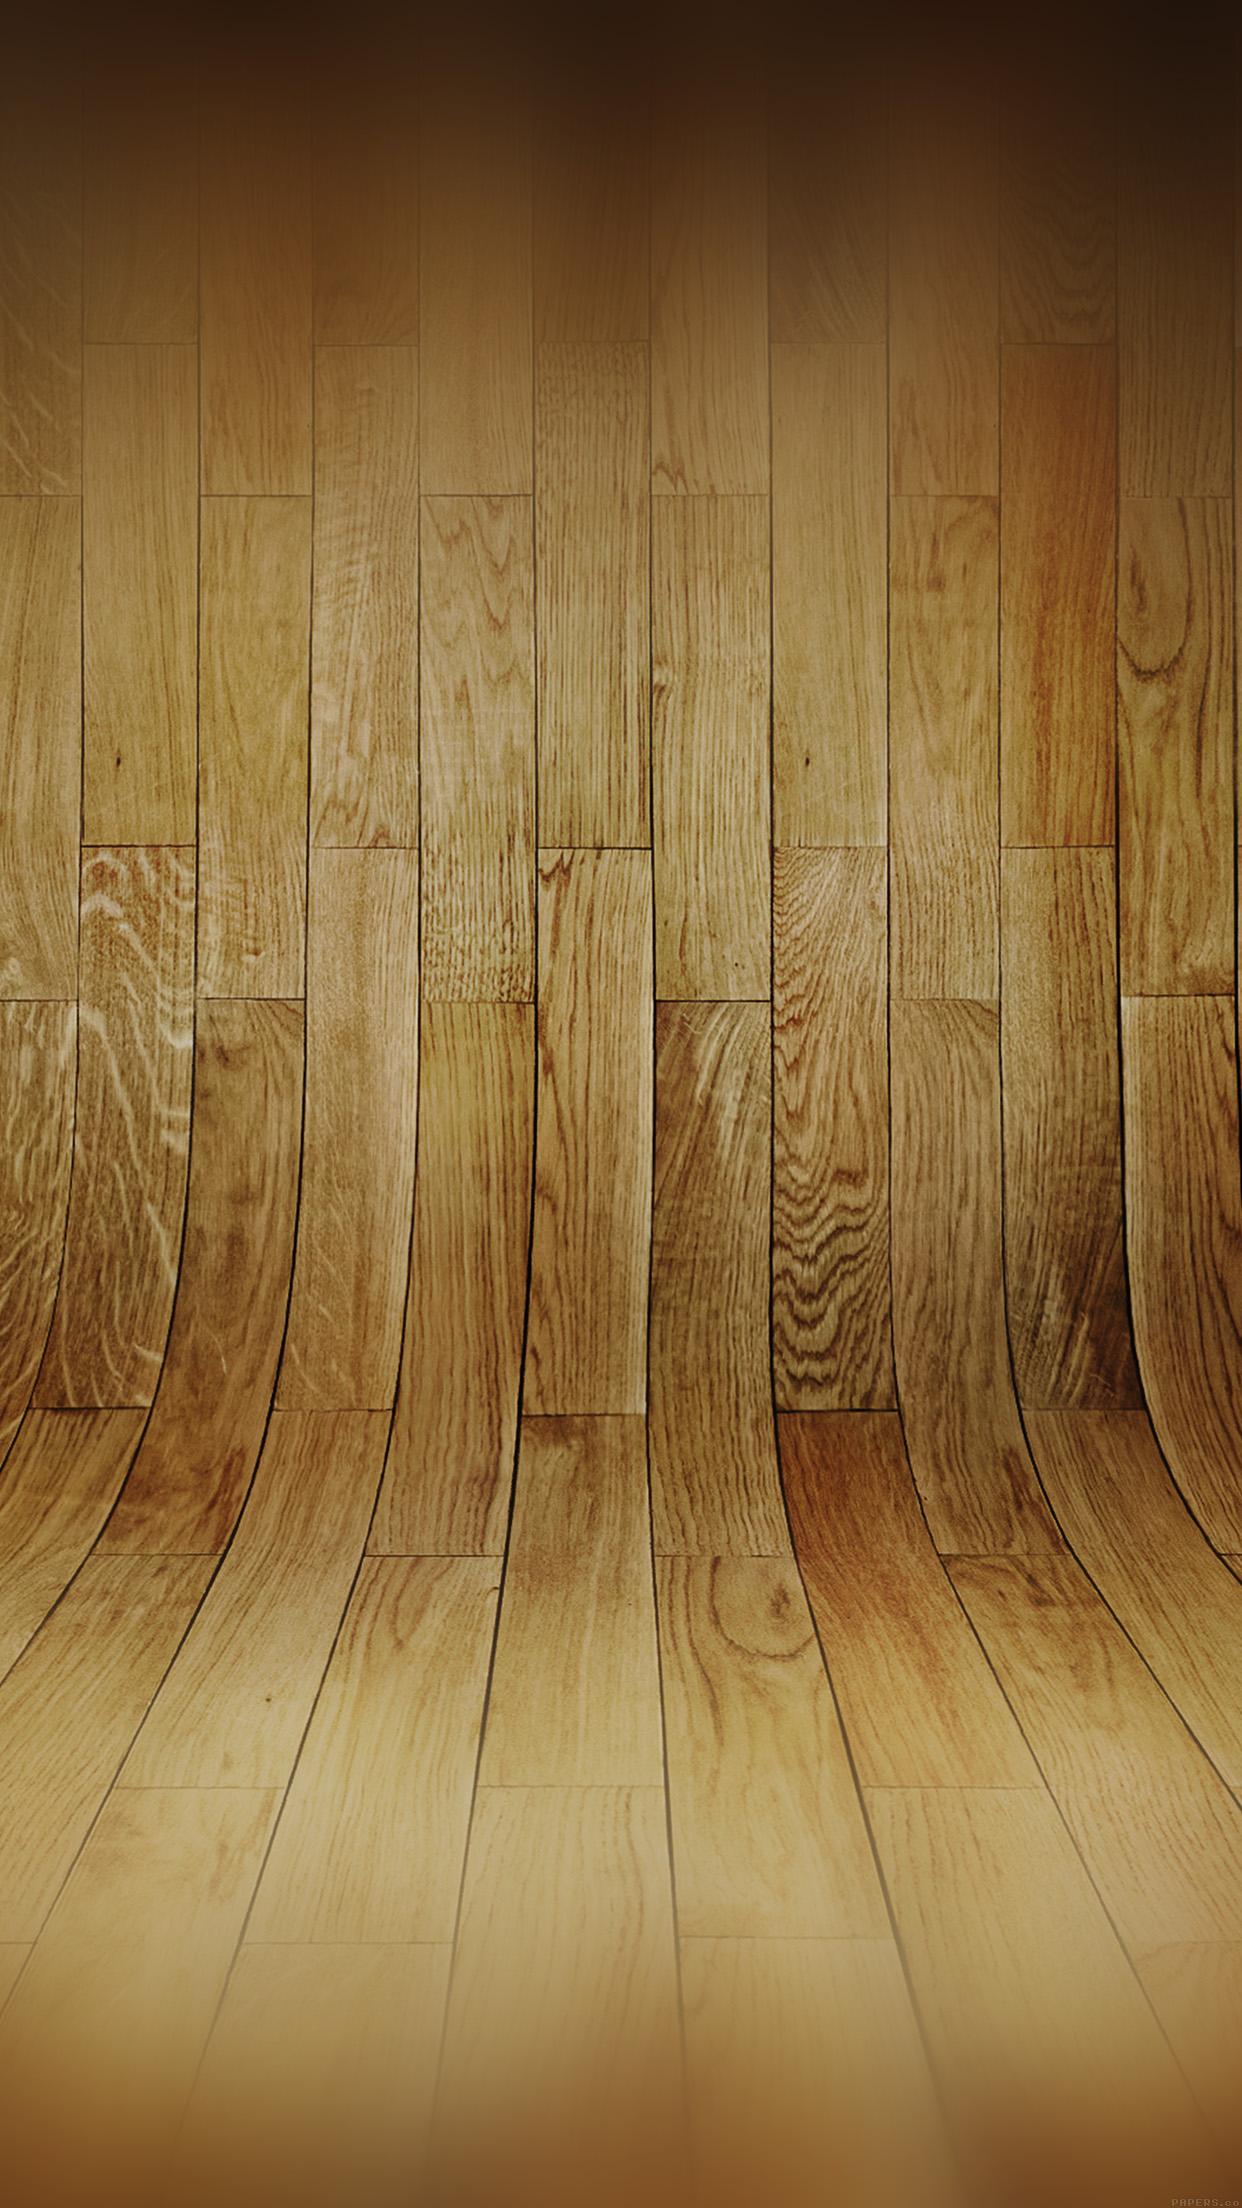 3D Wood Planks Texture iPhone 6 Plus HD Wallpaper iPod Wallpaper 1242x2208